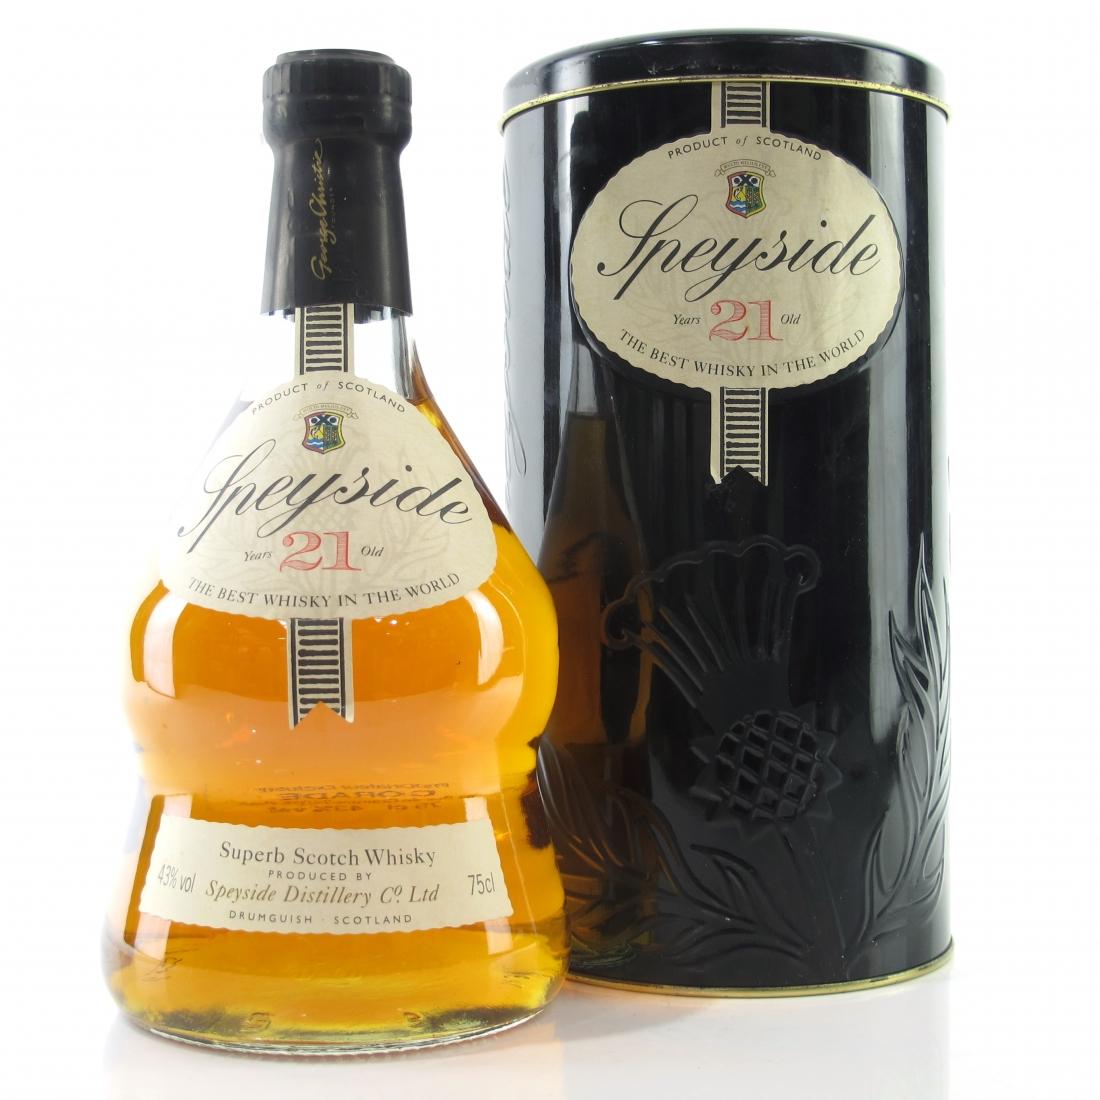 Speyside 21 Year Old Scotch Whisky